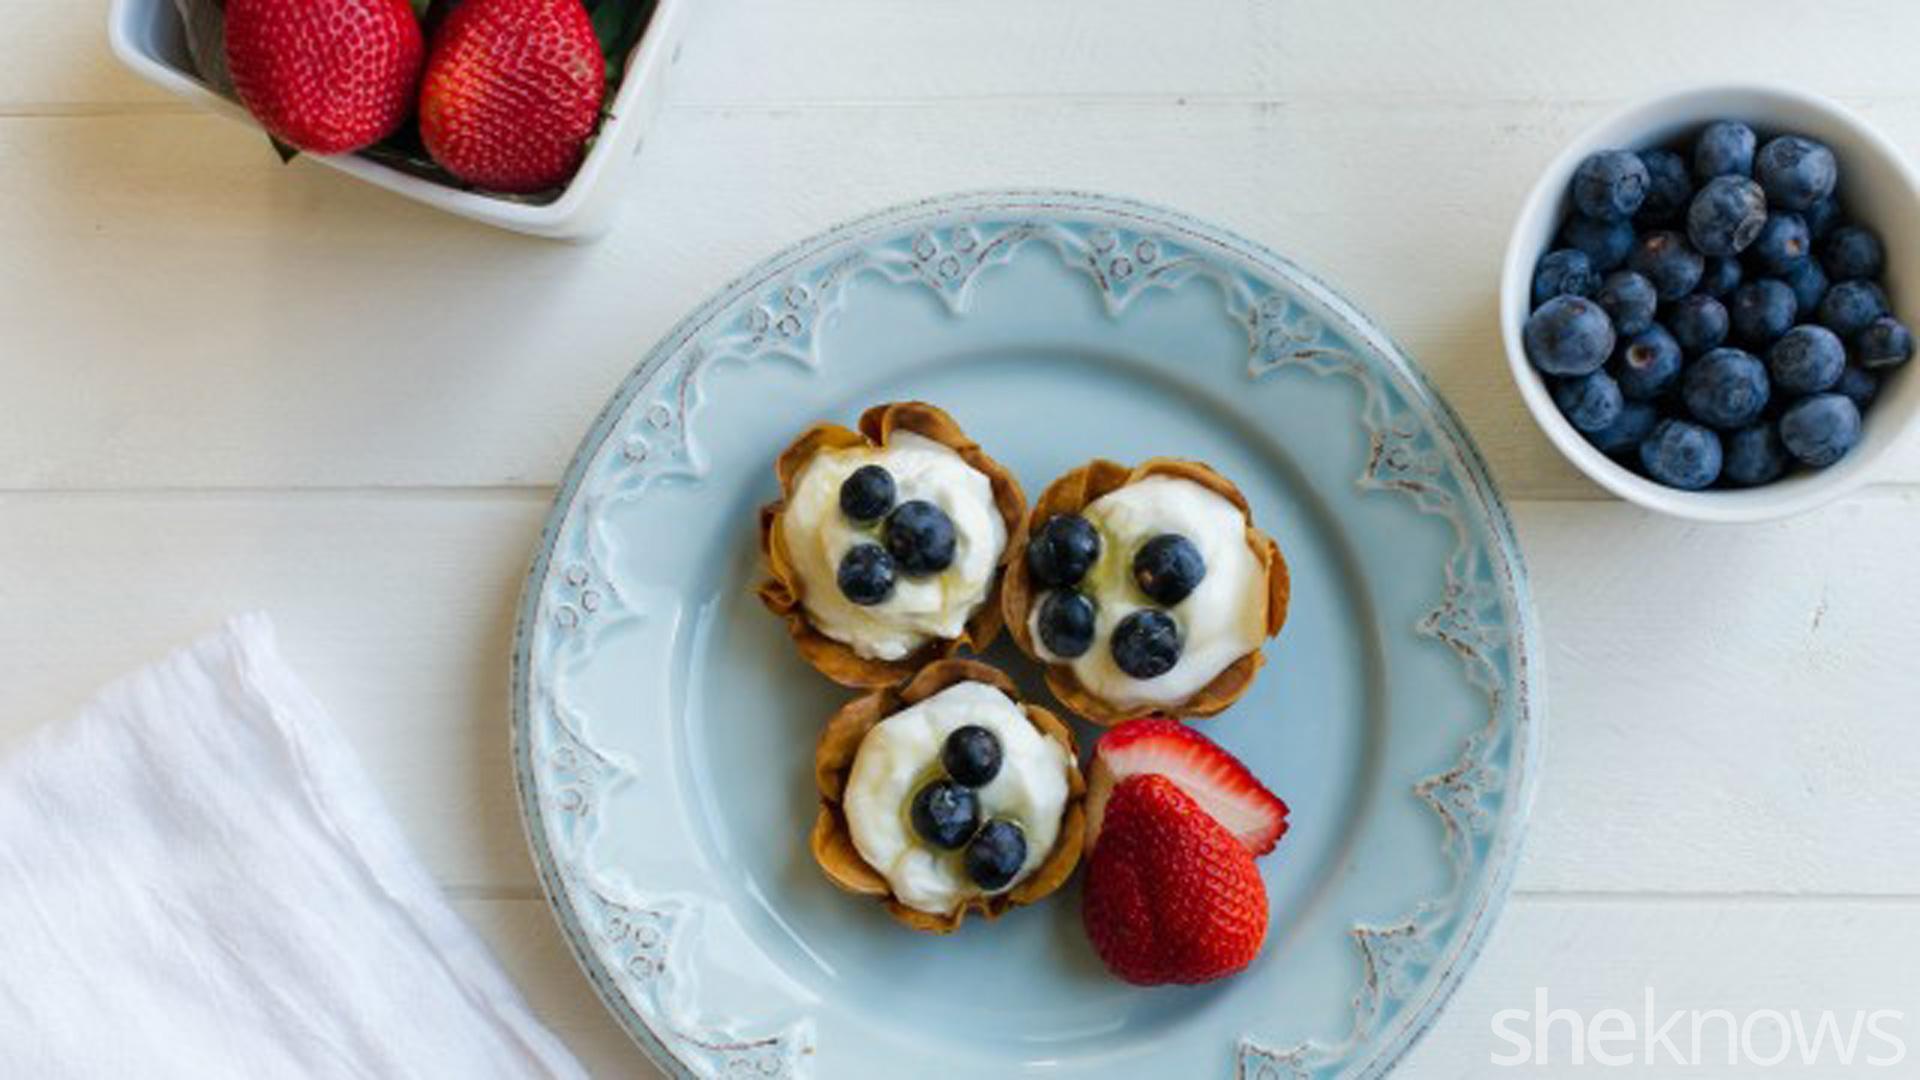 Flower-shaped phyllo yogurt fruit tarts